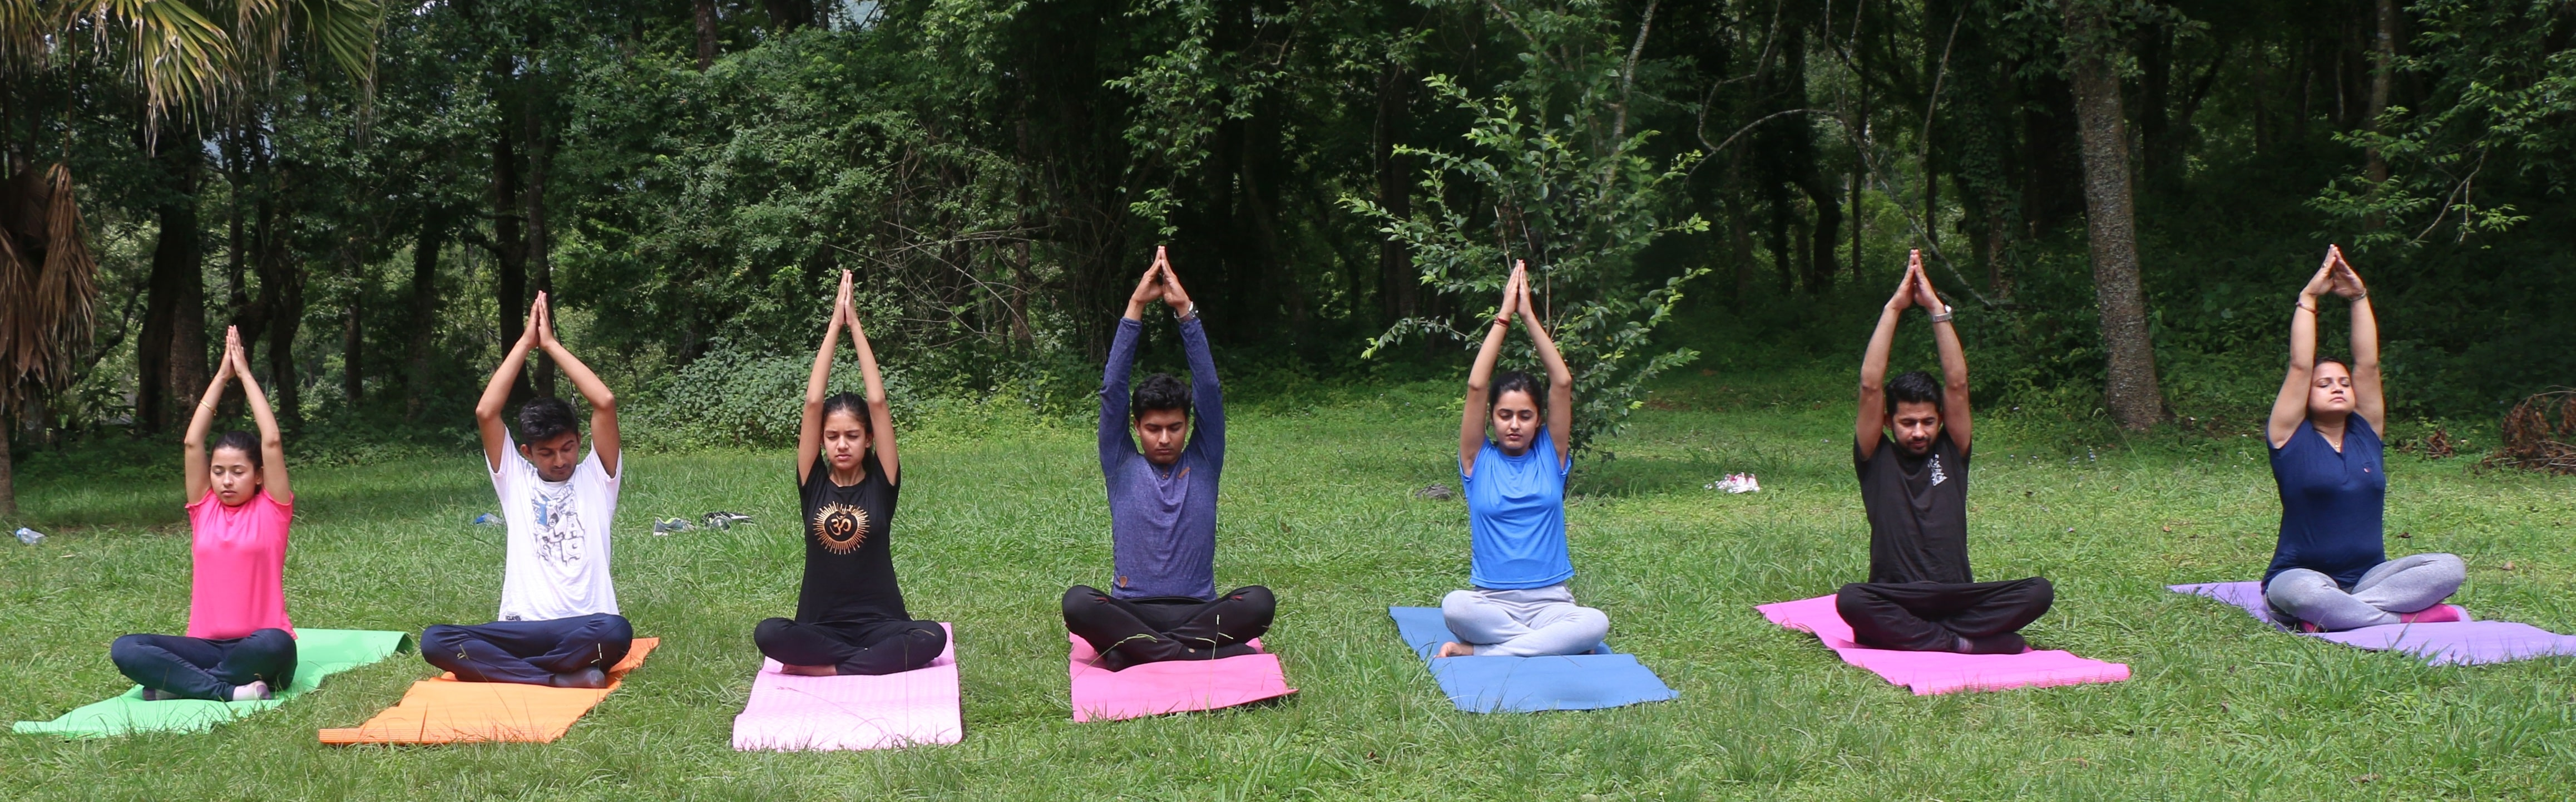 Yoga In Nepal | Yoga Teacher Training in Nepal